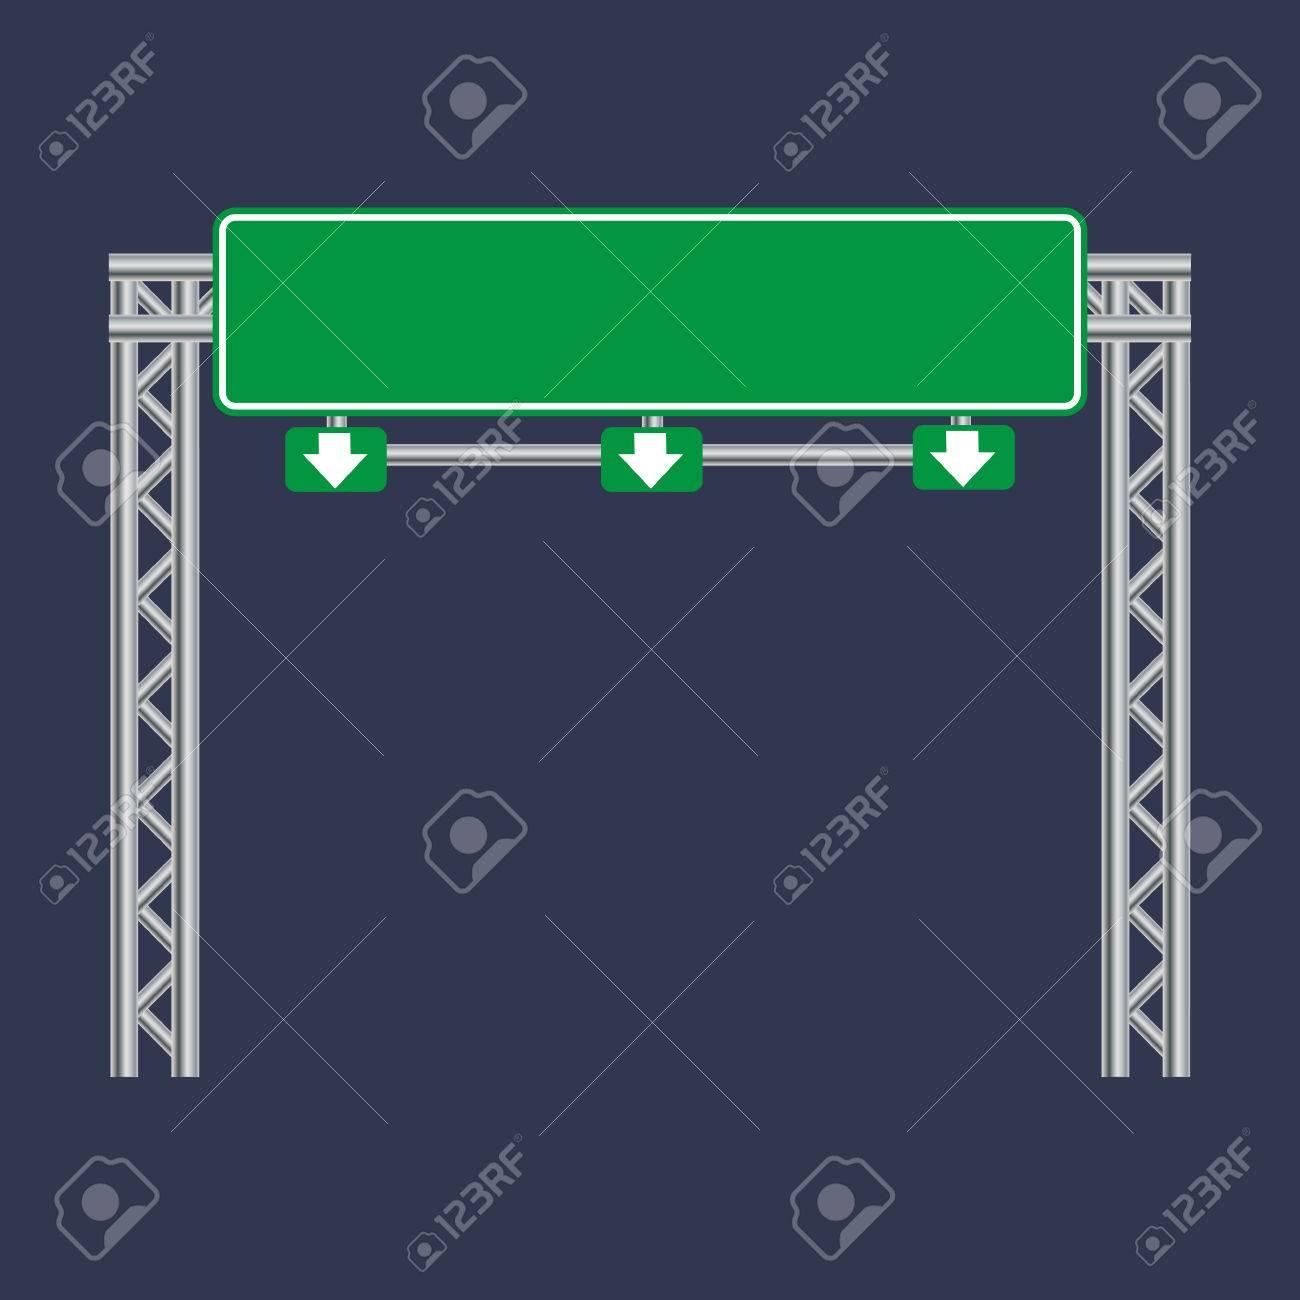 blank green traffic road sign on black stock vector - 44105360